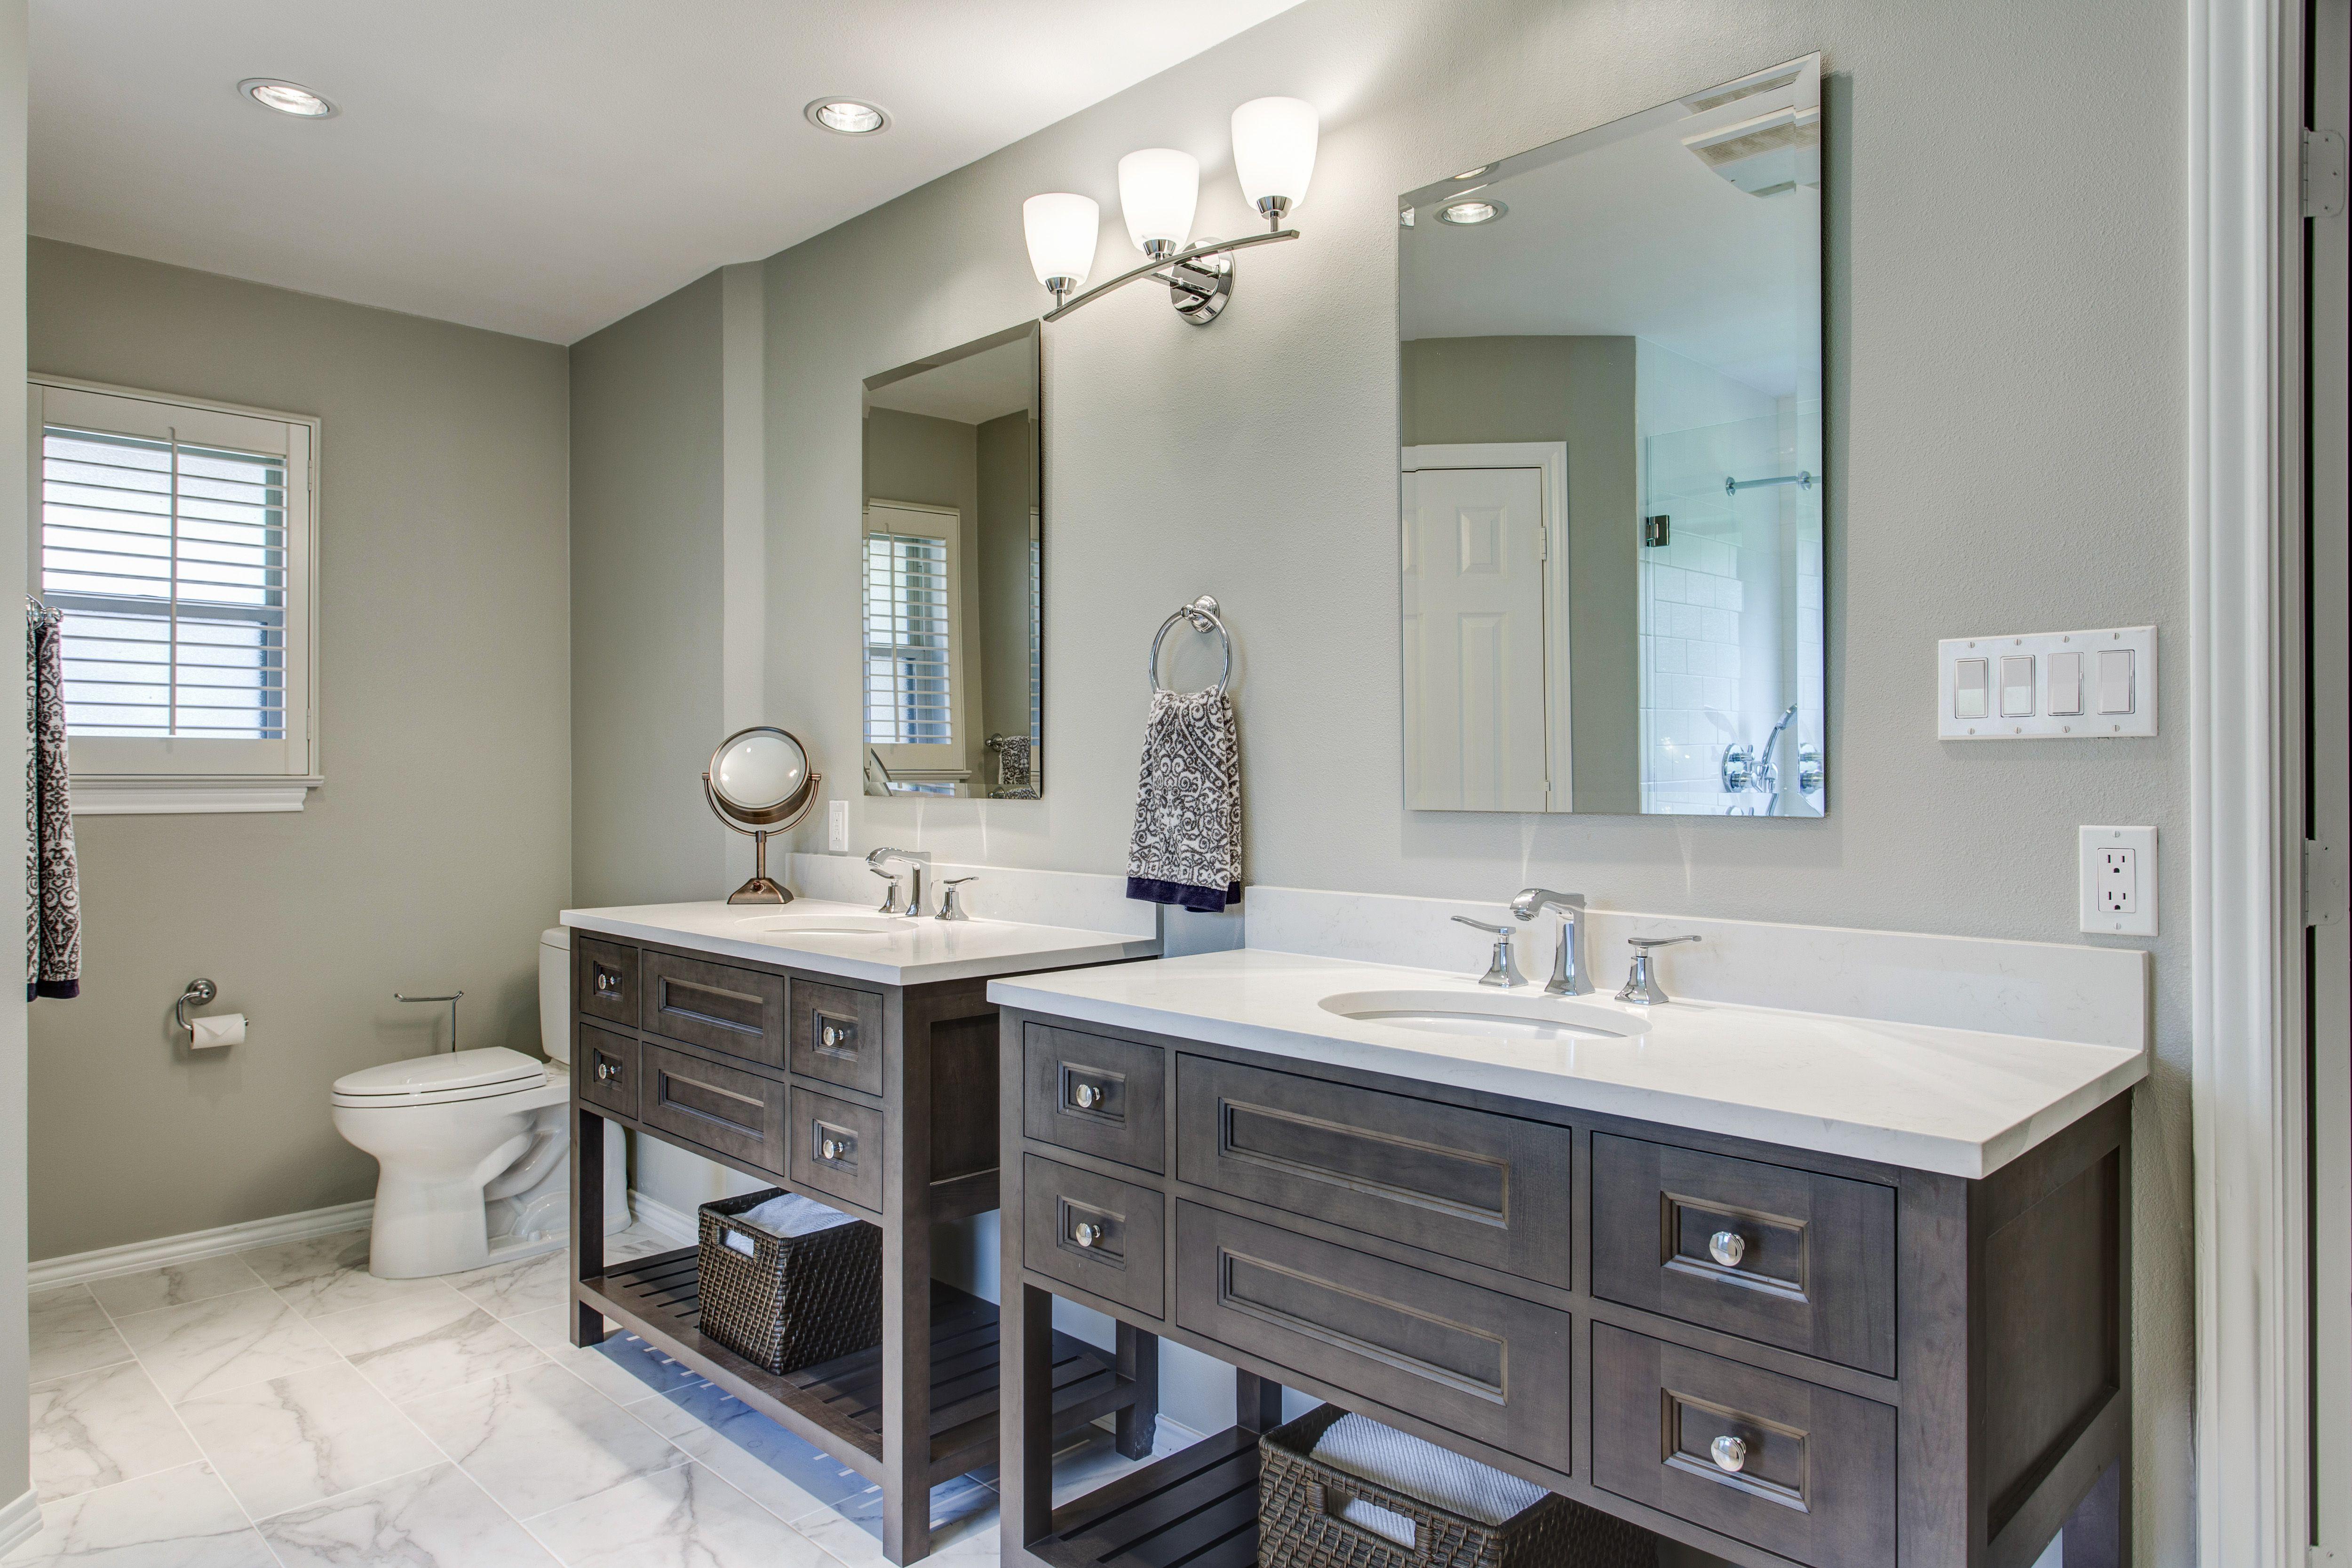 wwwoods shiloh cabinets, aspen maple silas w/ graphite highlight